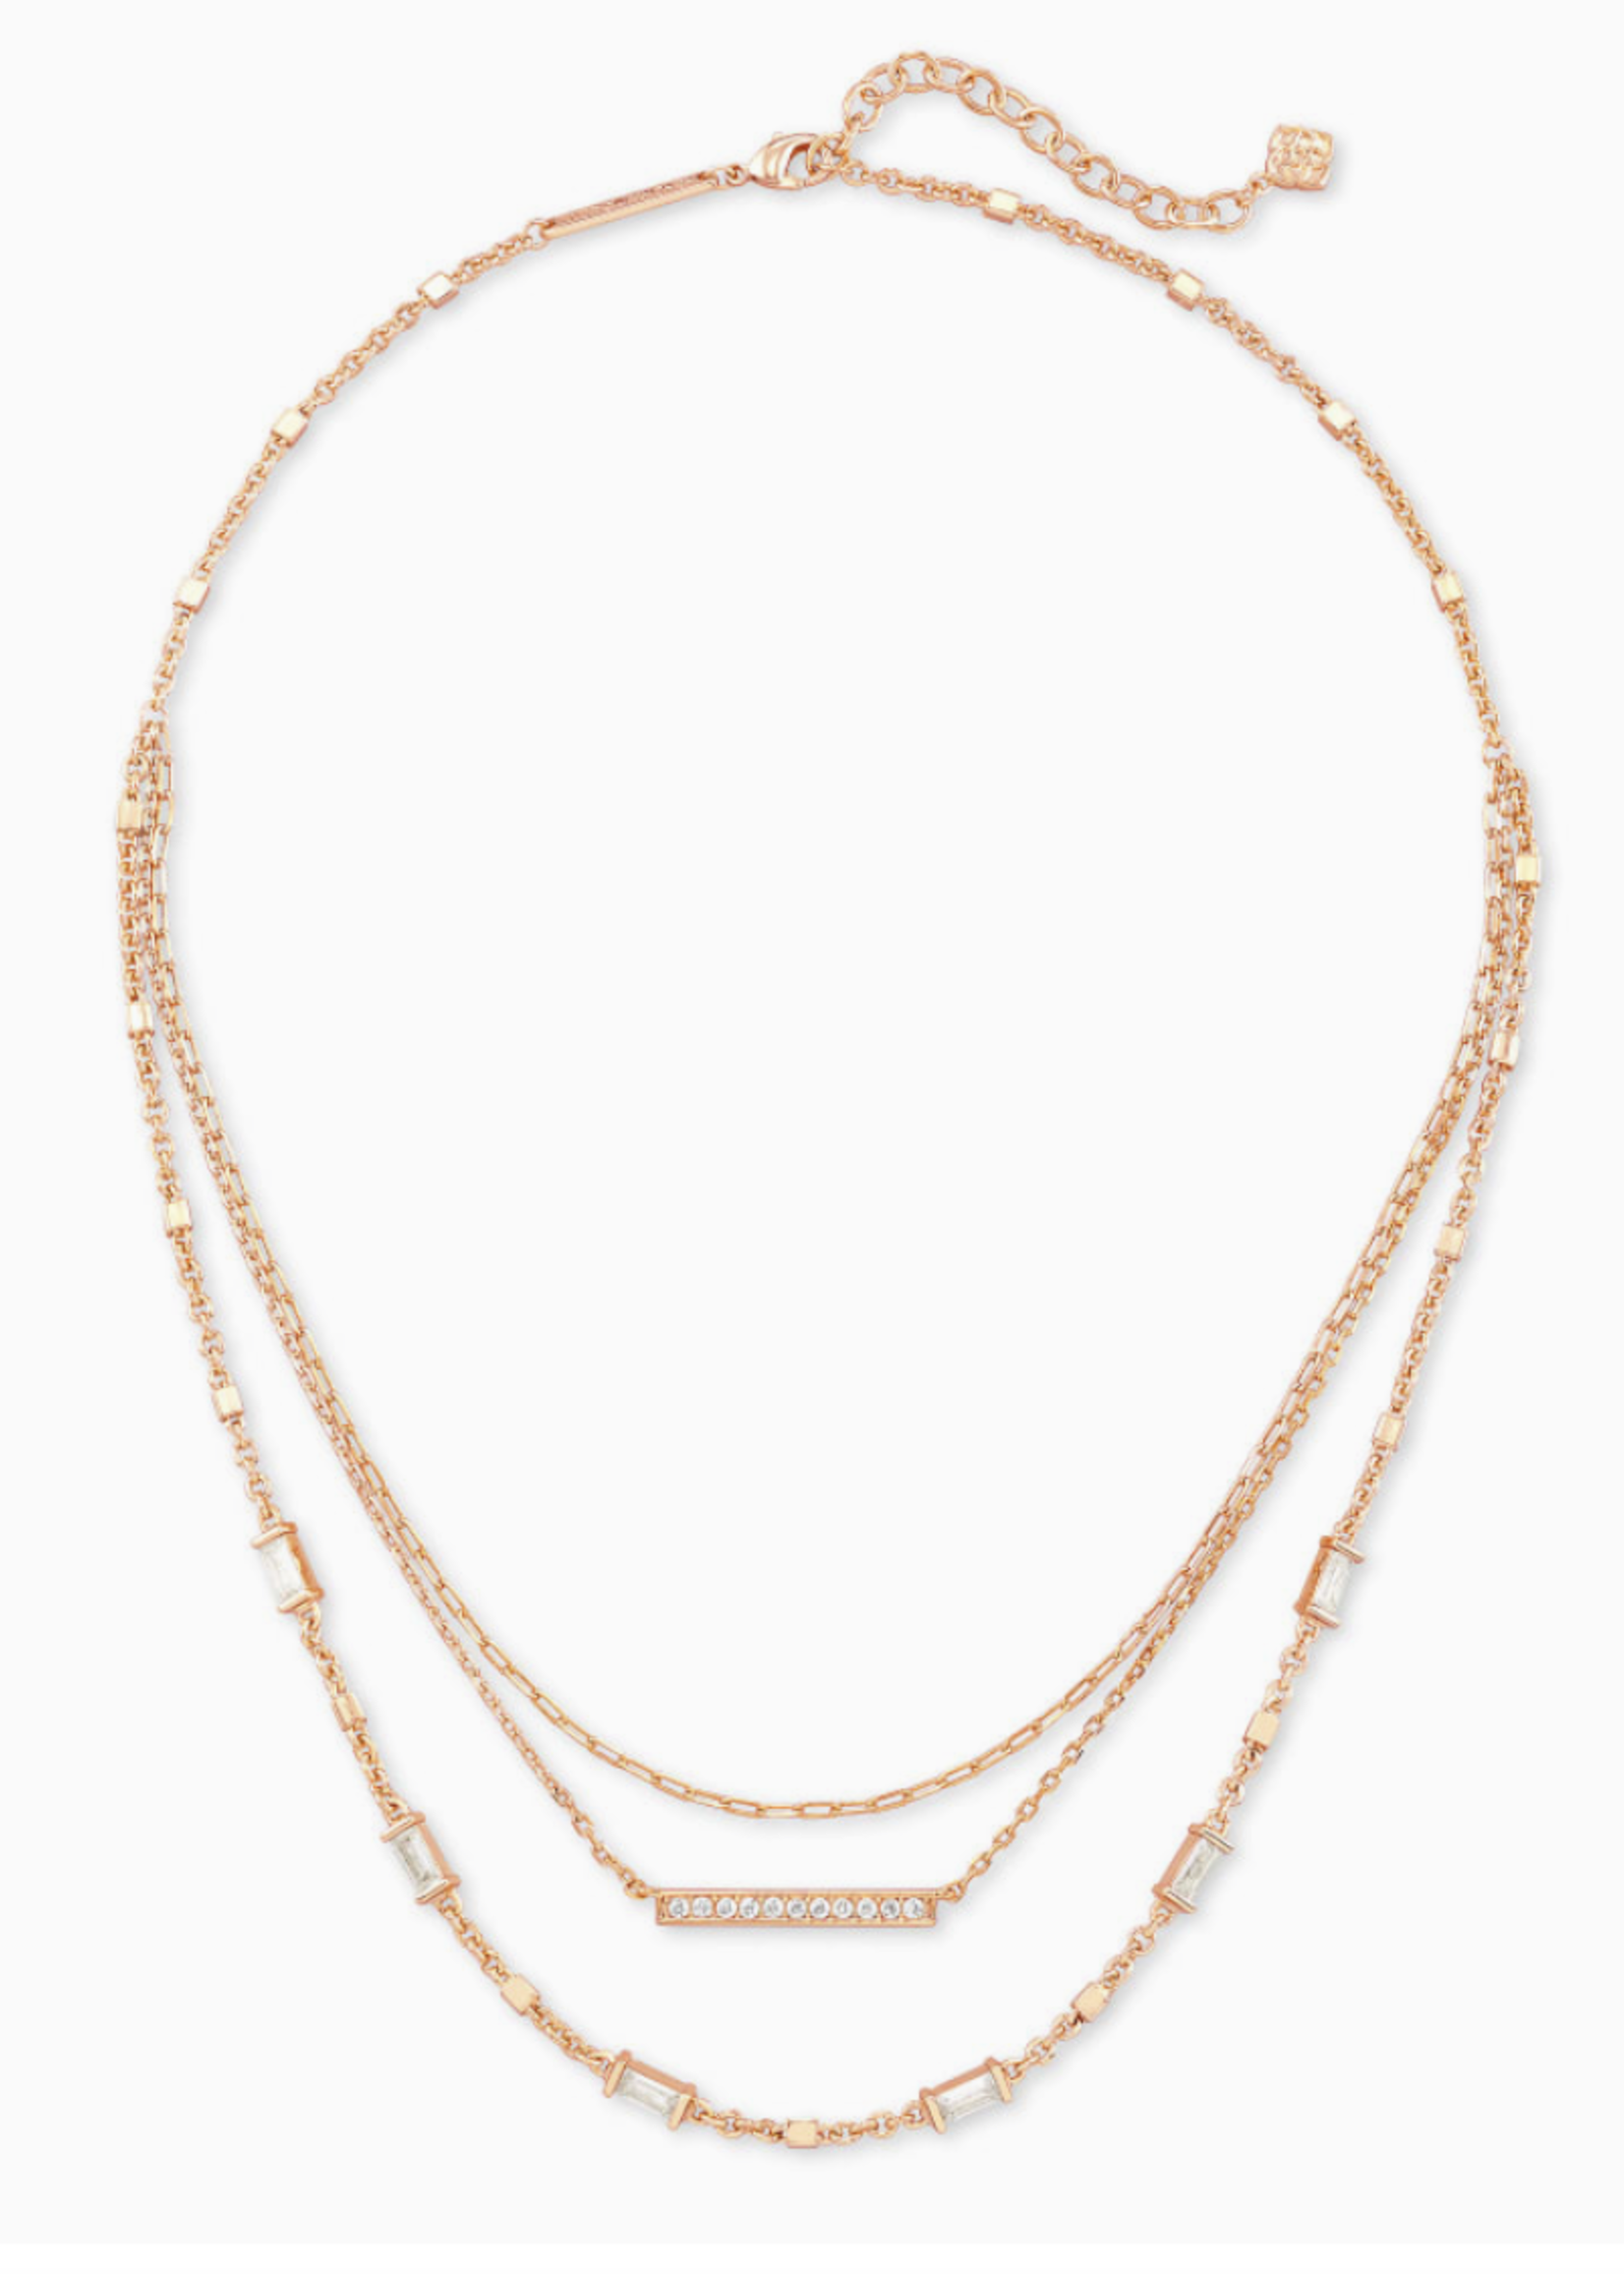 Kendra Scott Kendra Scott  Addison Multi Strand Necklace Rose Gold